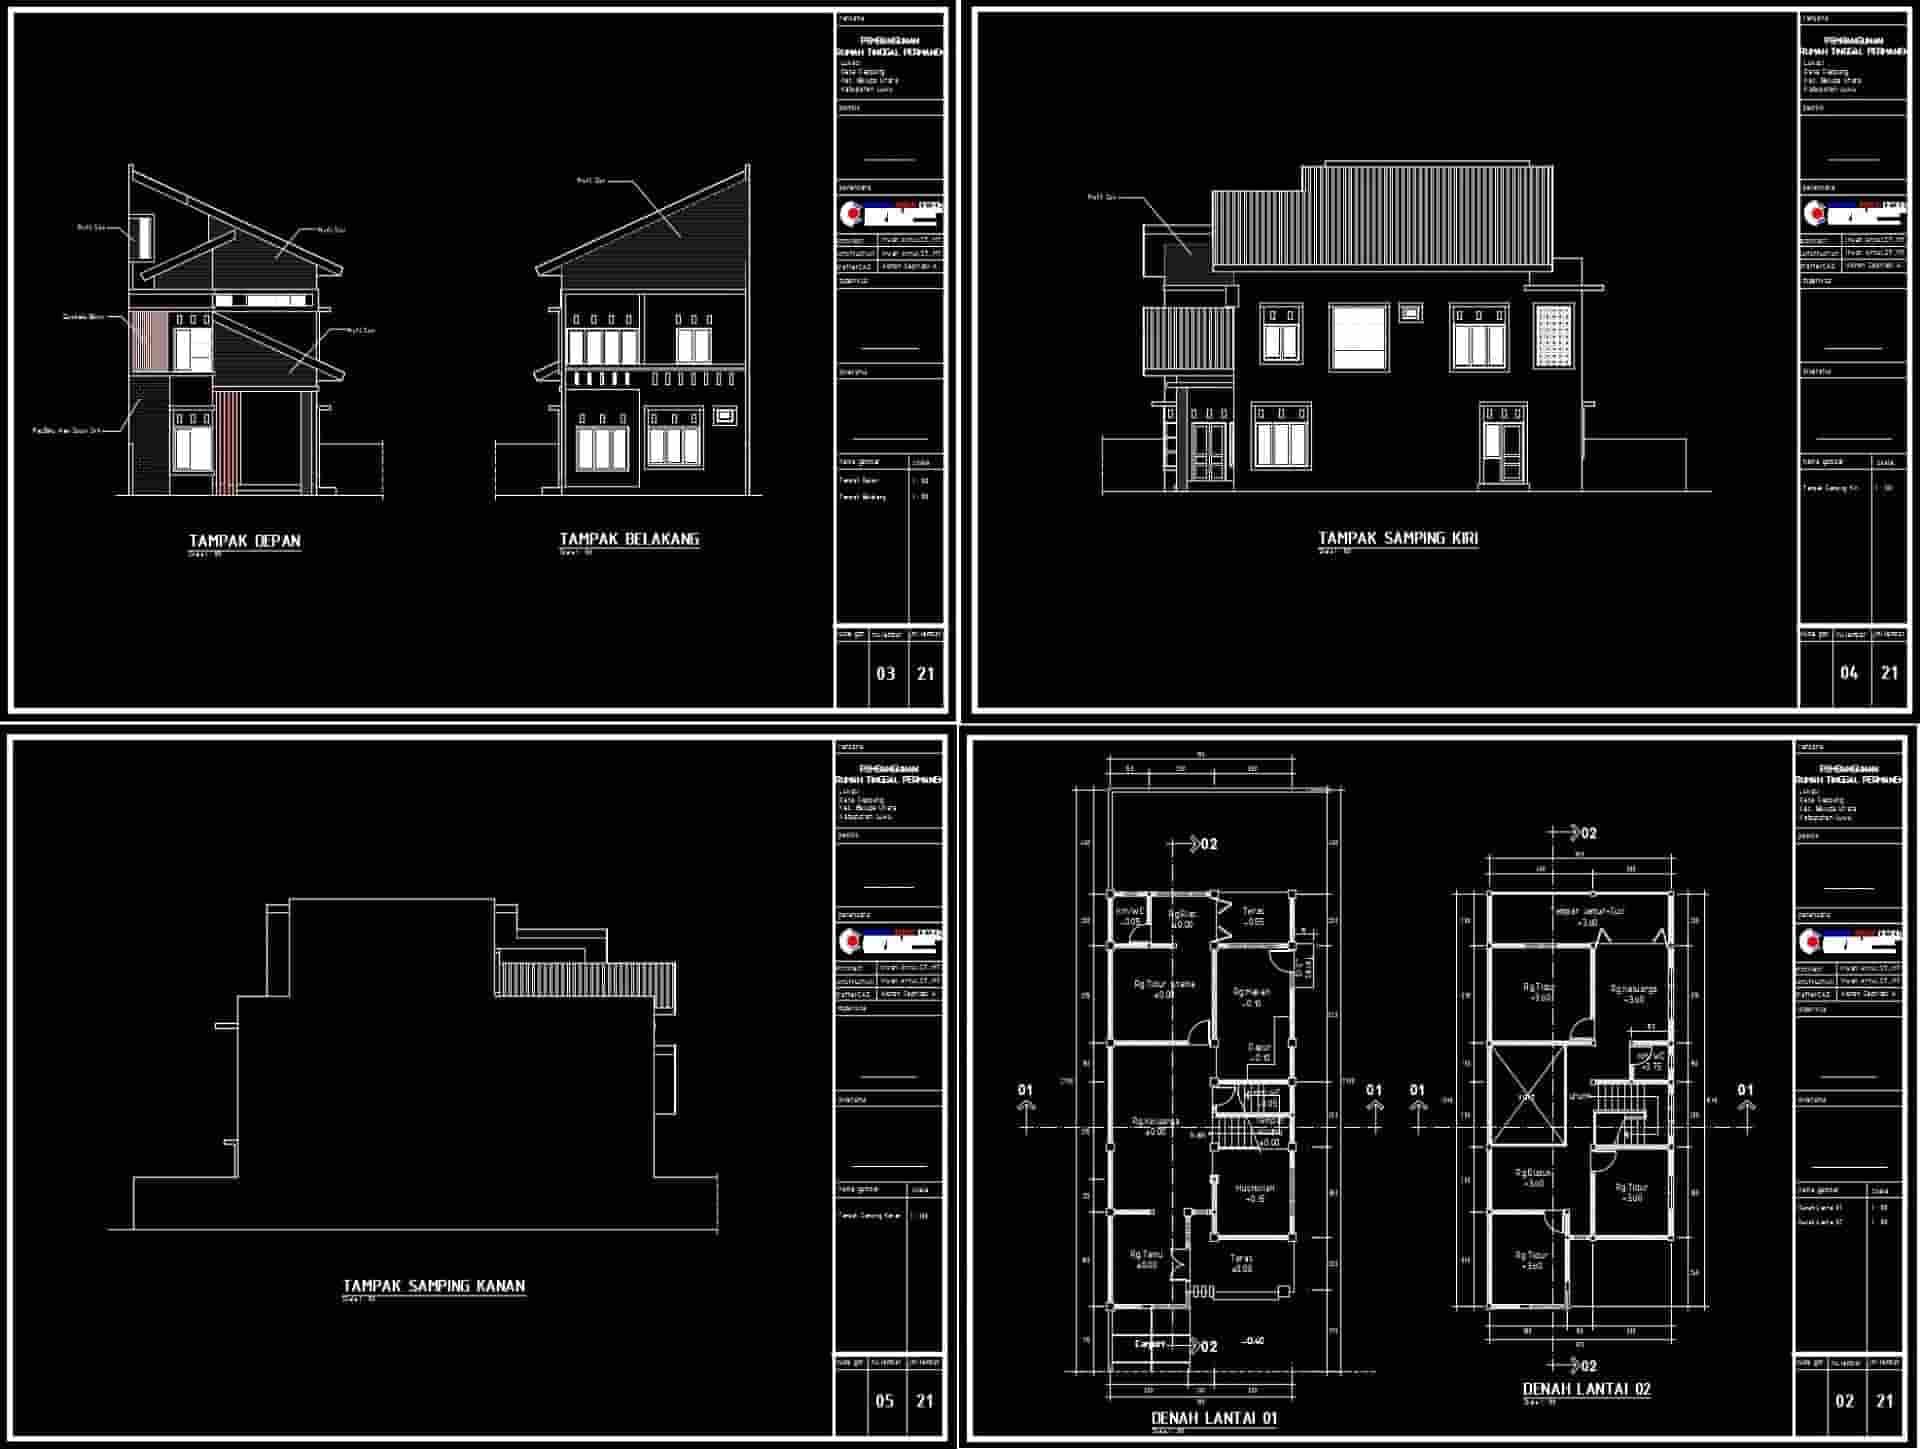 700 Gambar Denah Rumah 2 Lantai Autocad Terbaik Gambar